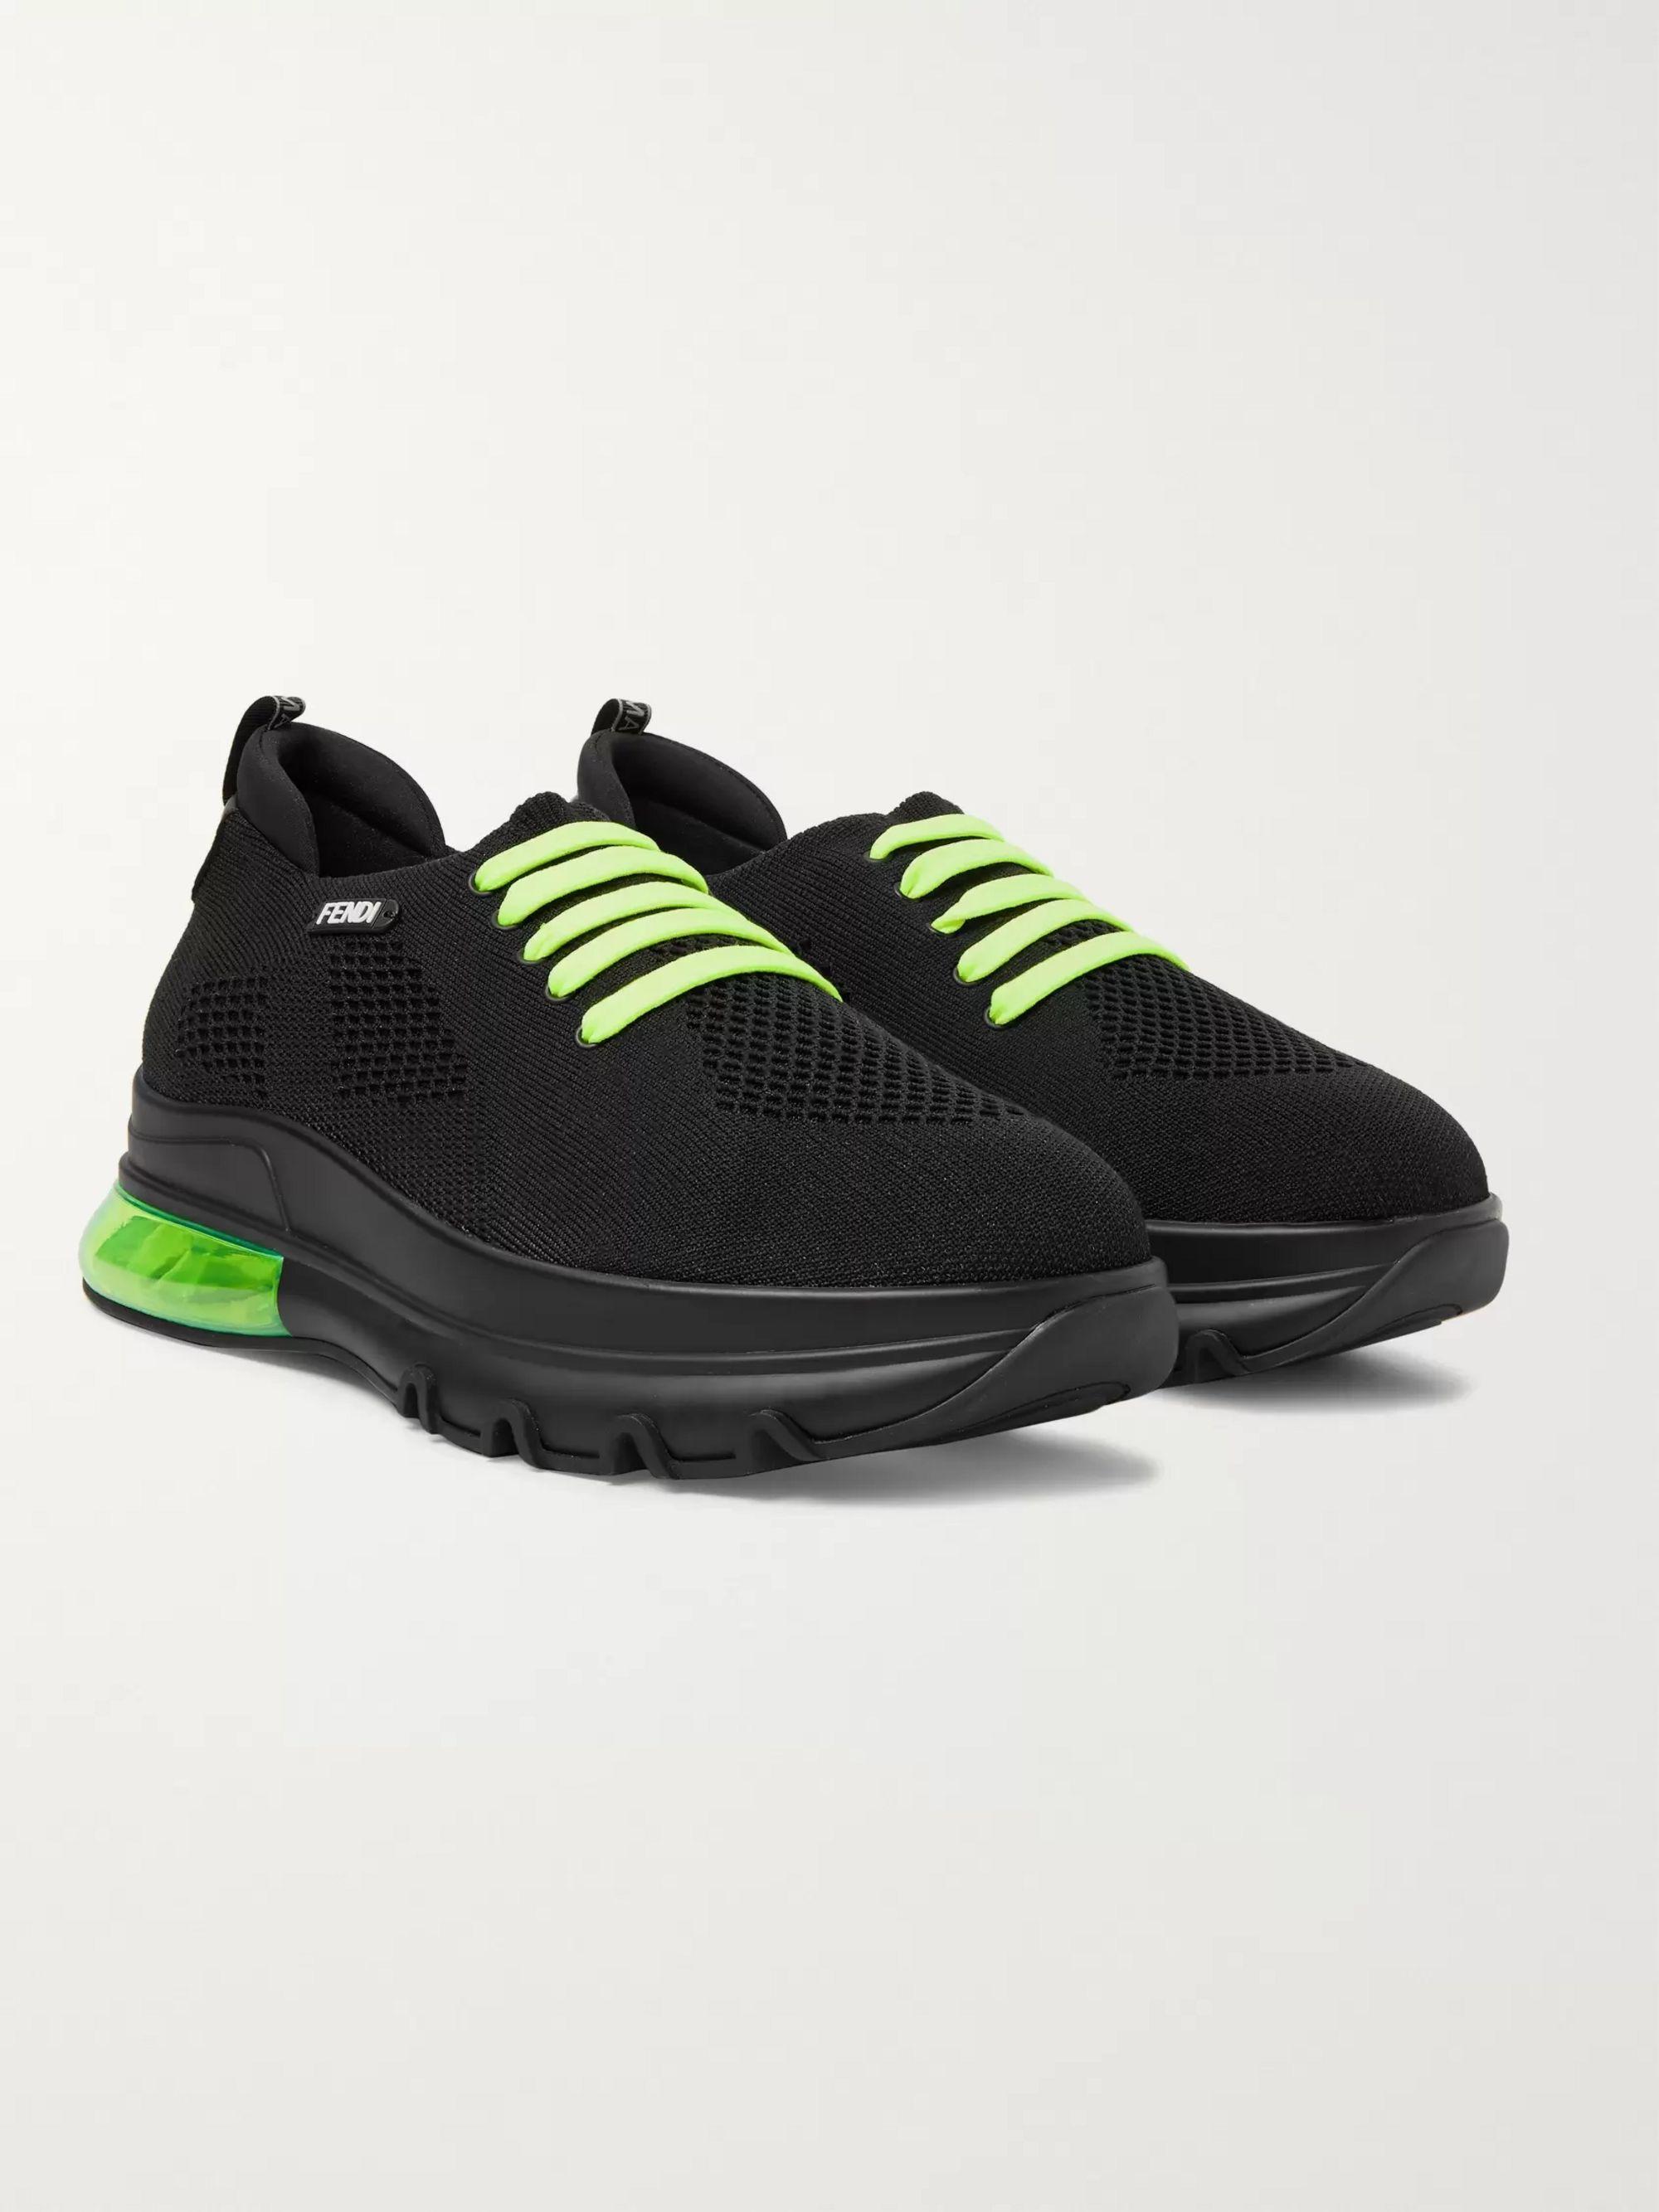 info for c0b79 c3cd1 Mesh Sneakers